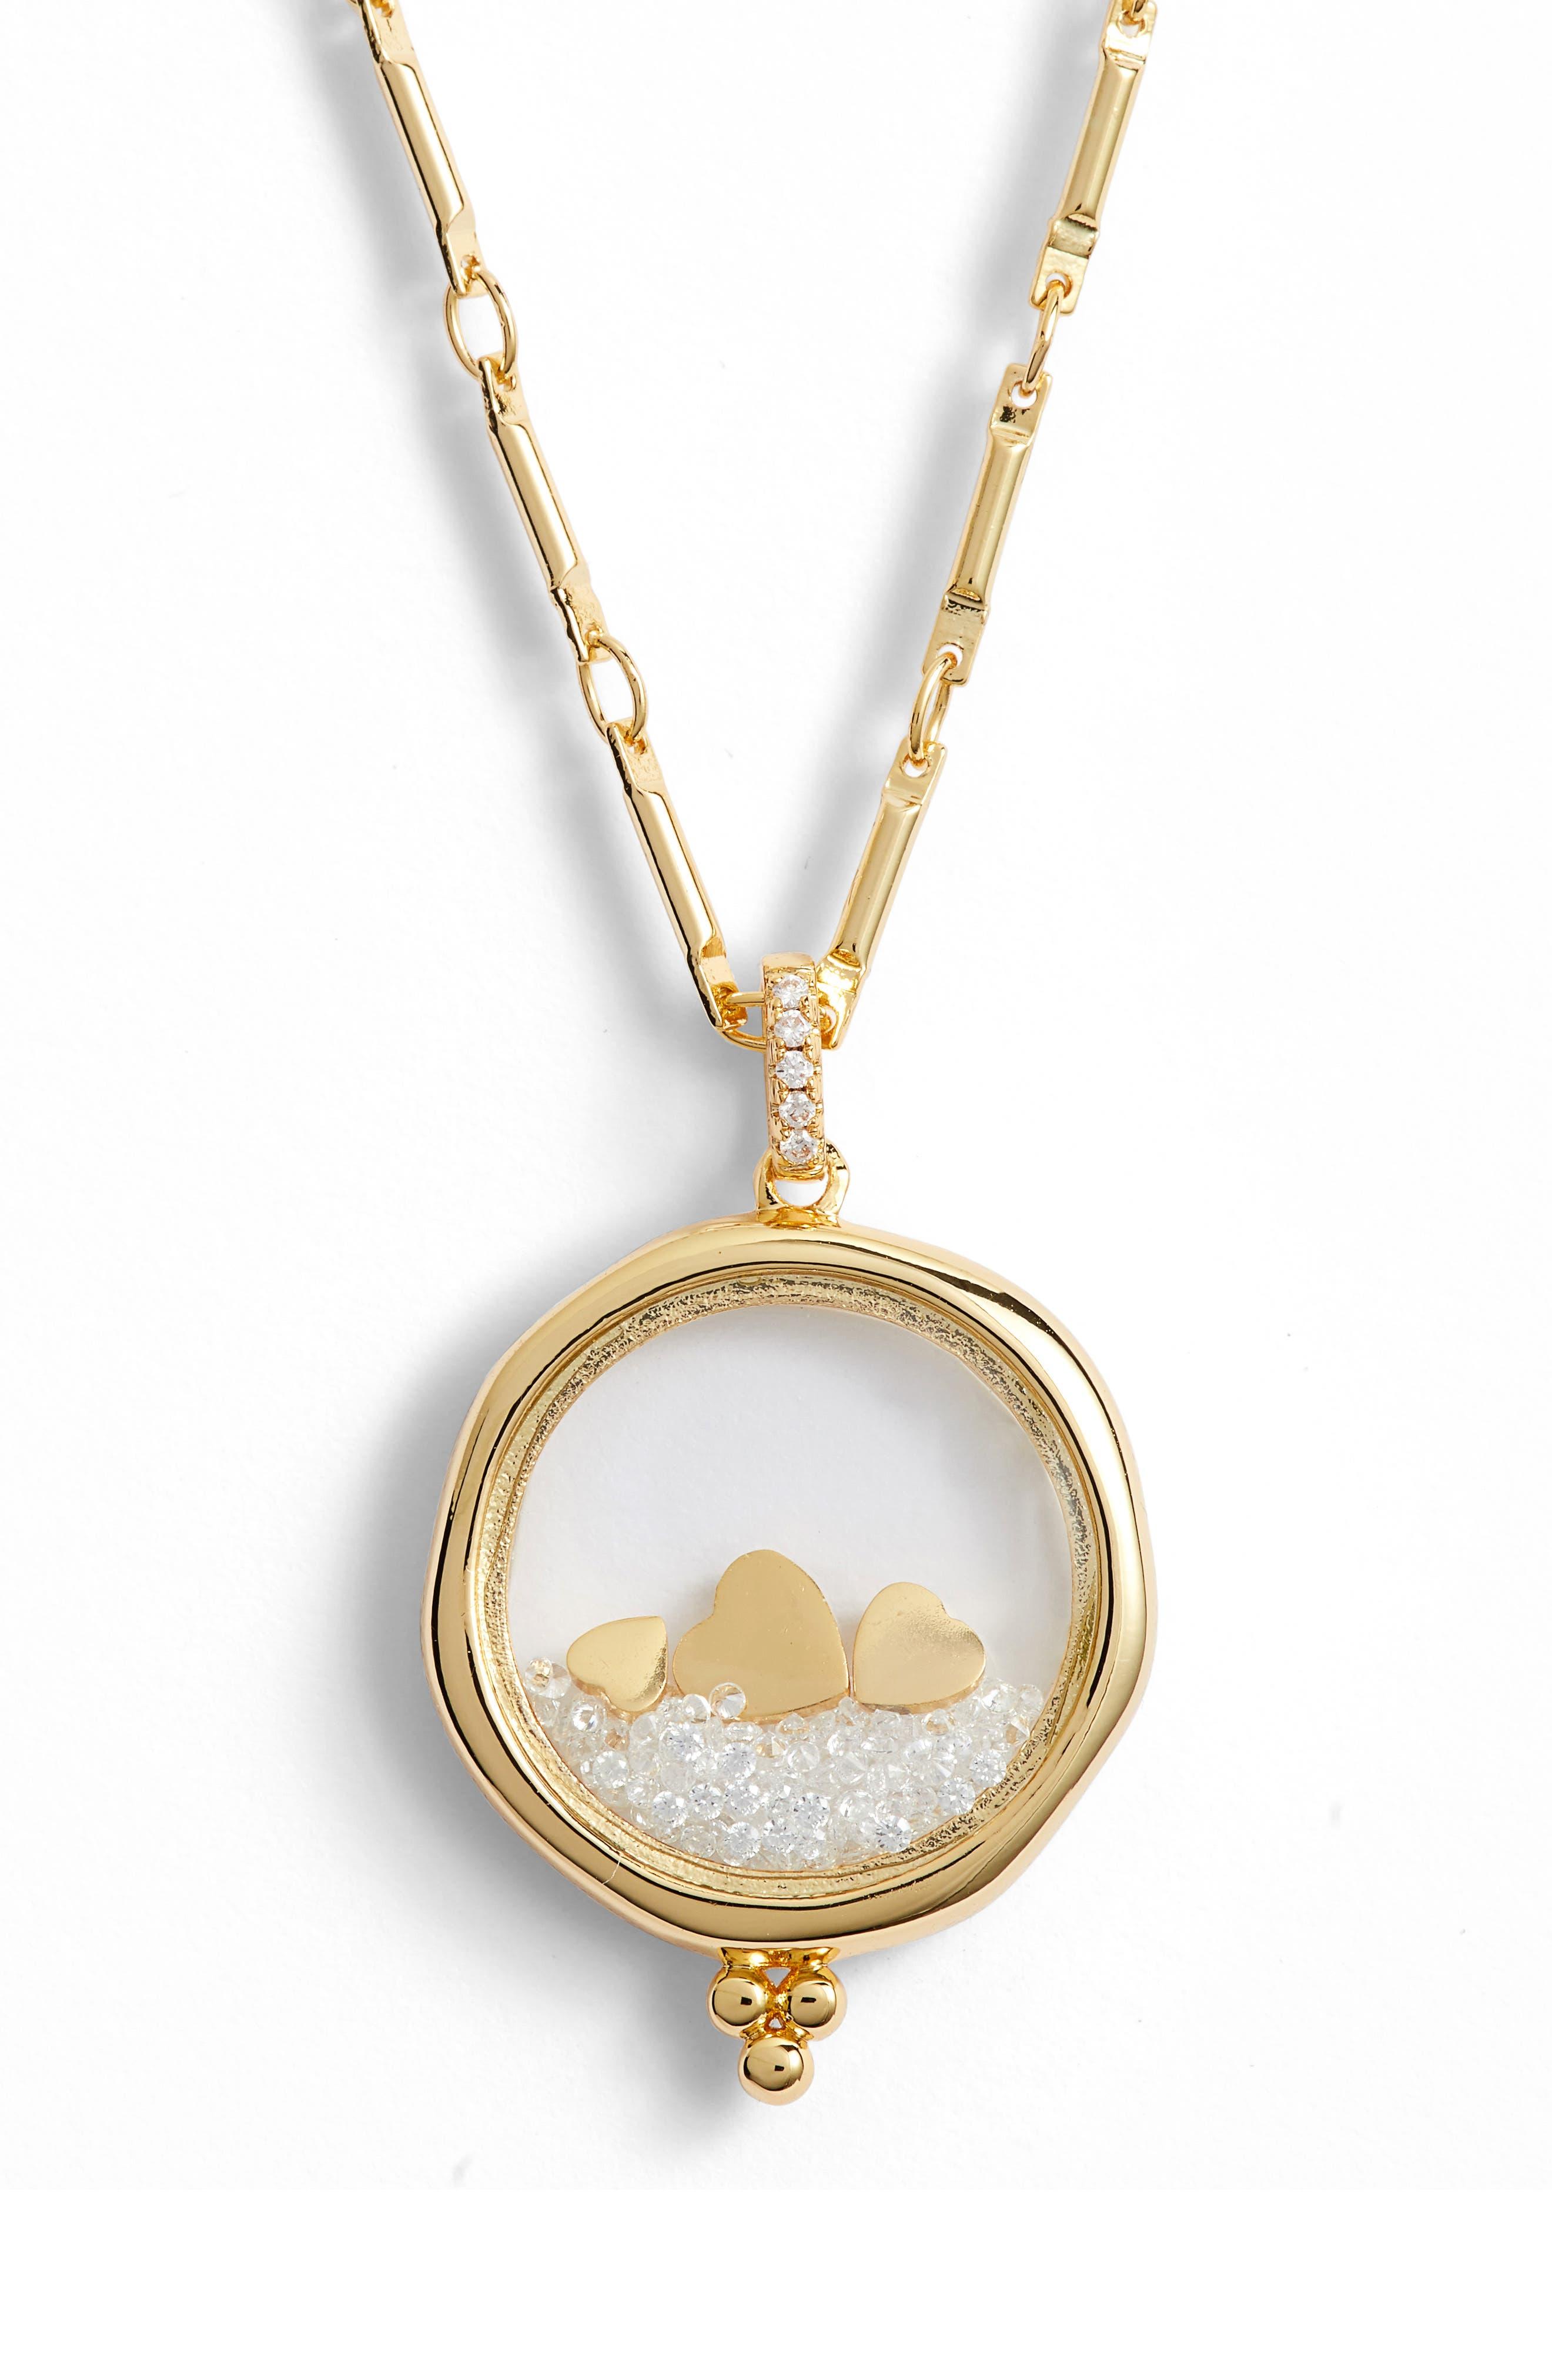 LULU DK X Kristina Schulman Love Shaker Pendant Necklace in Gold